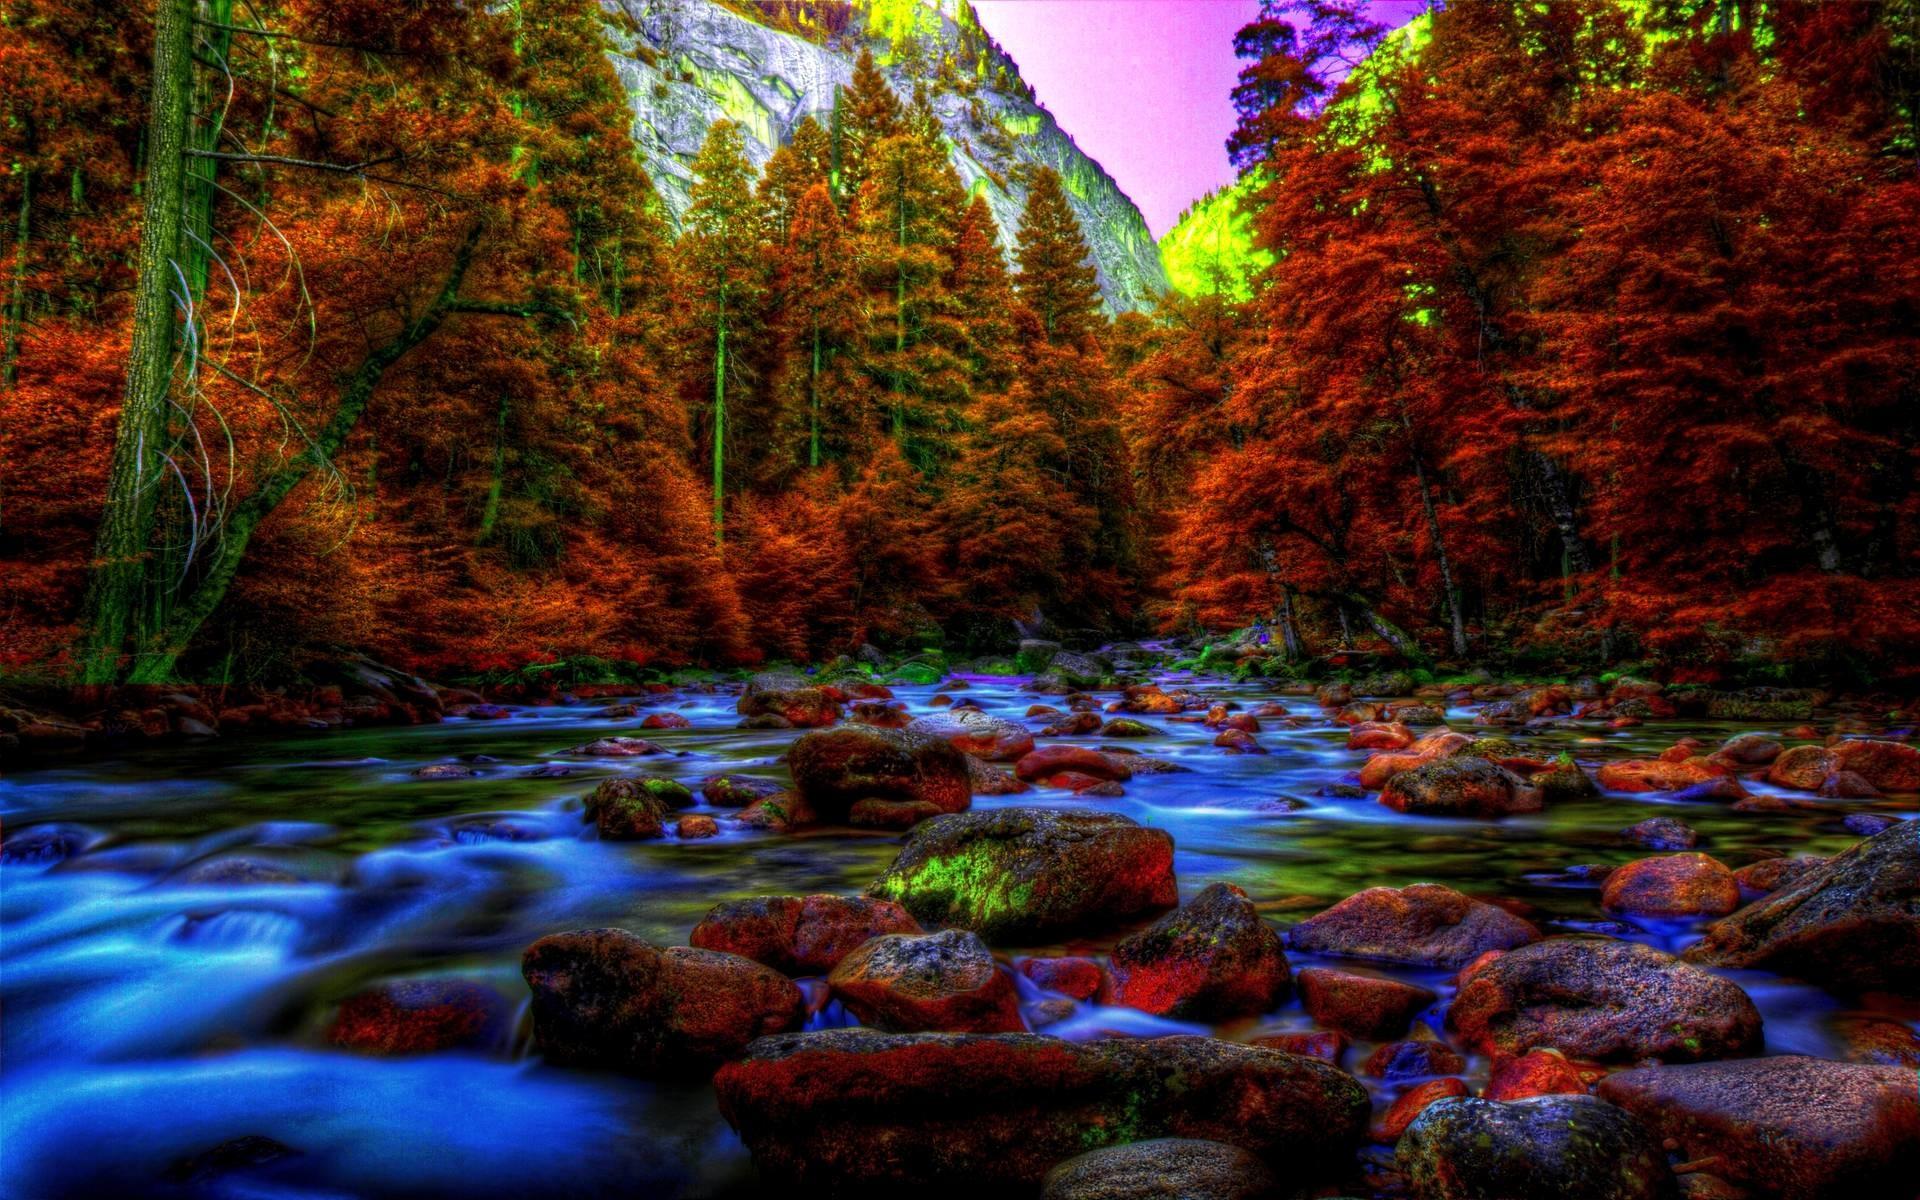 Hd Yosmite In Autumn Wallpaper Fall Wallpaper Hd 1920x1200 Wallpaper Teahub Io